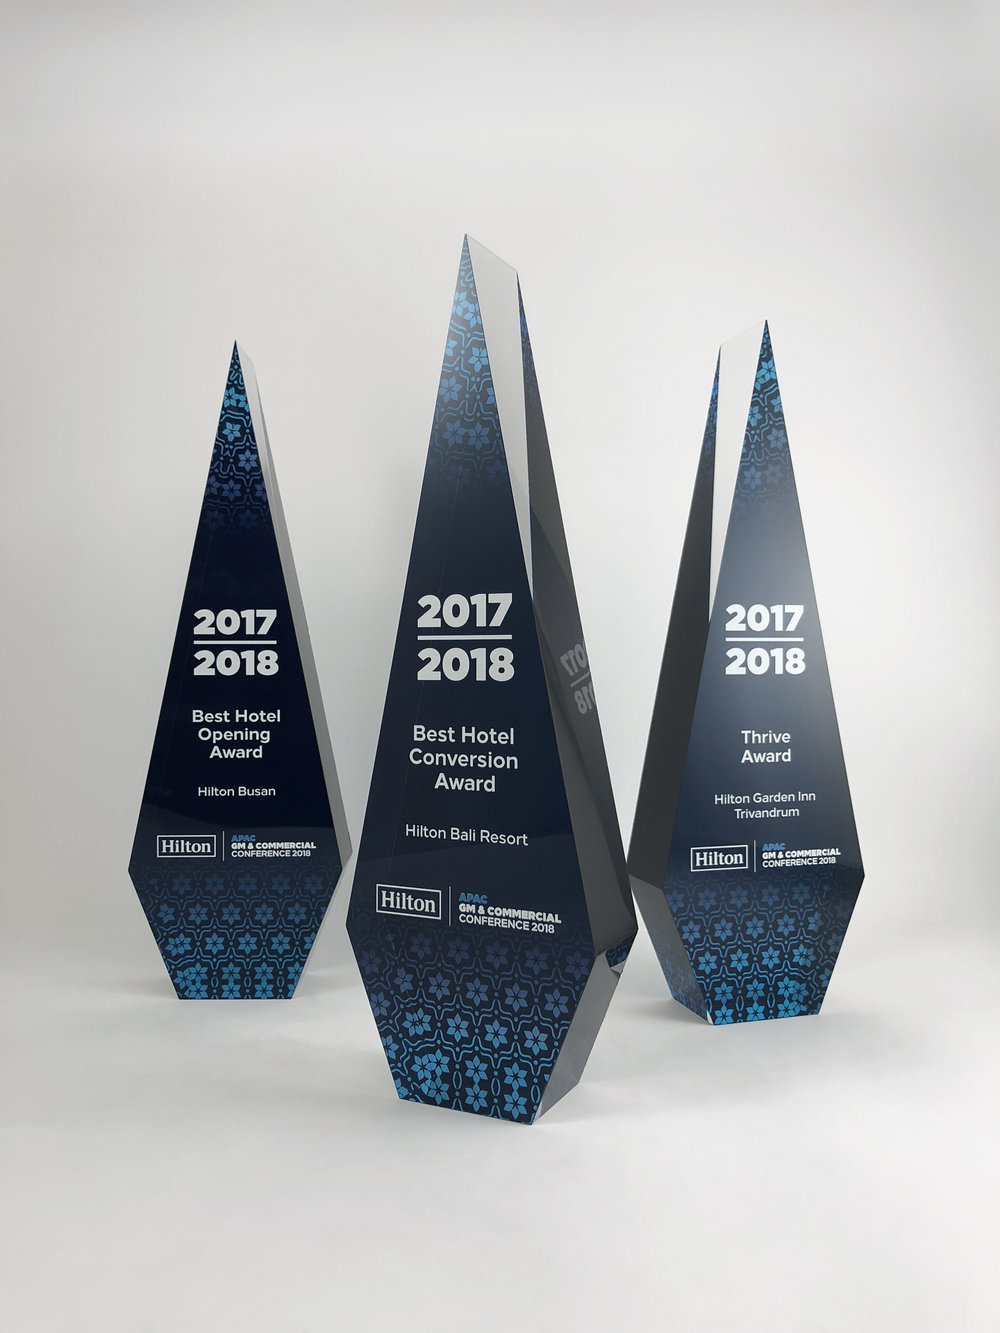 hilton-apac-awards-acrylic-trophy-02.jpg